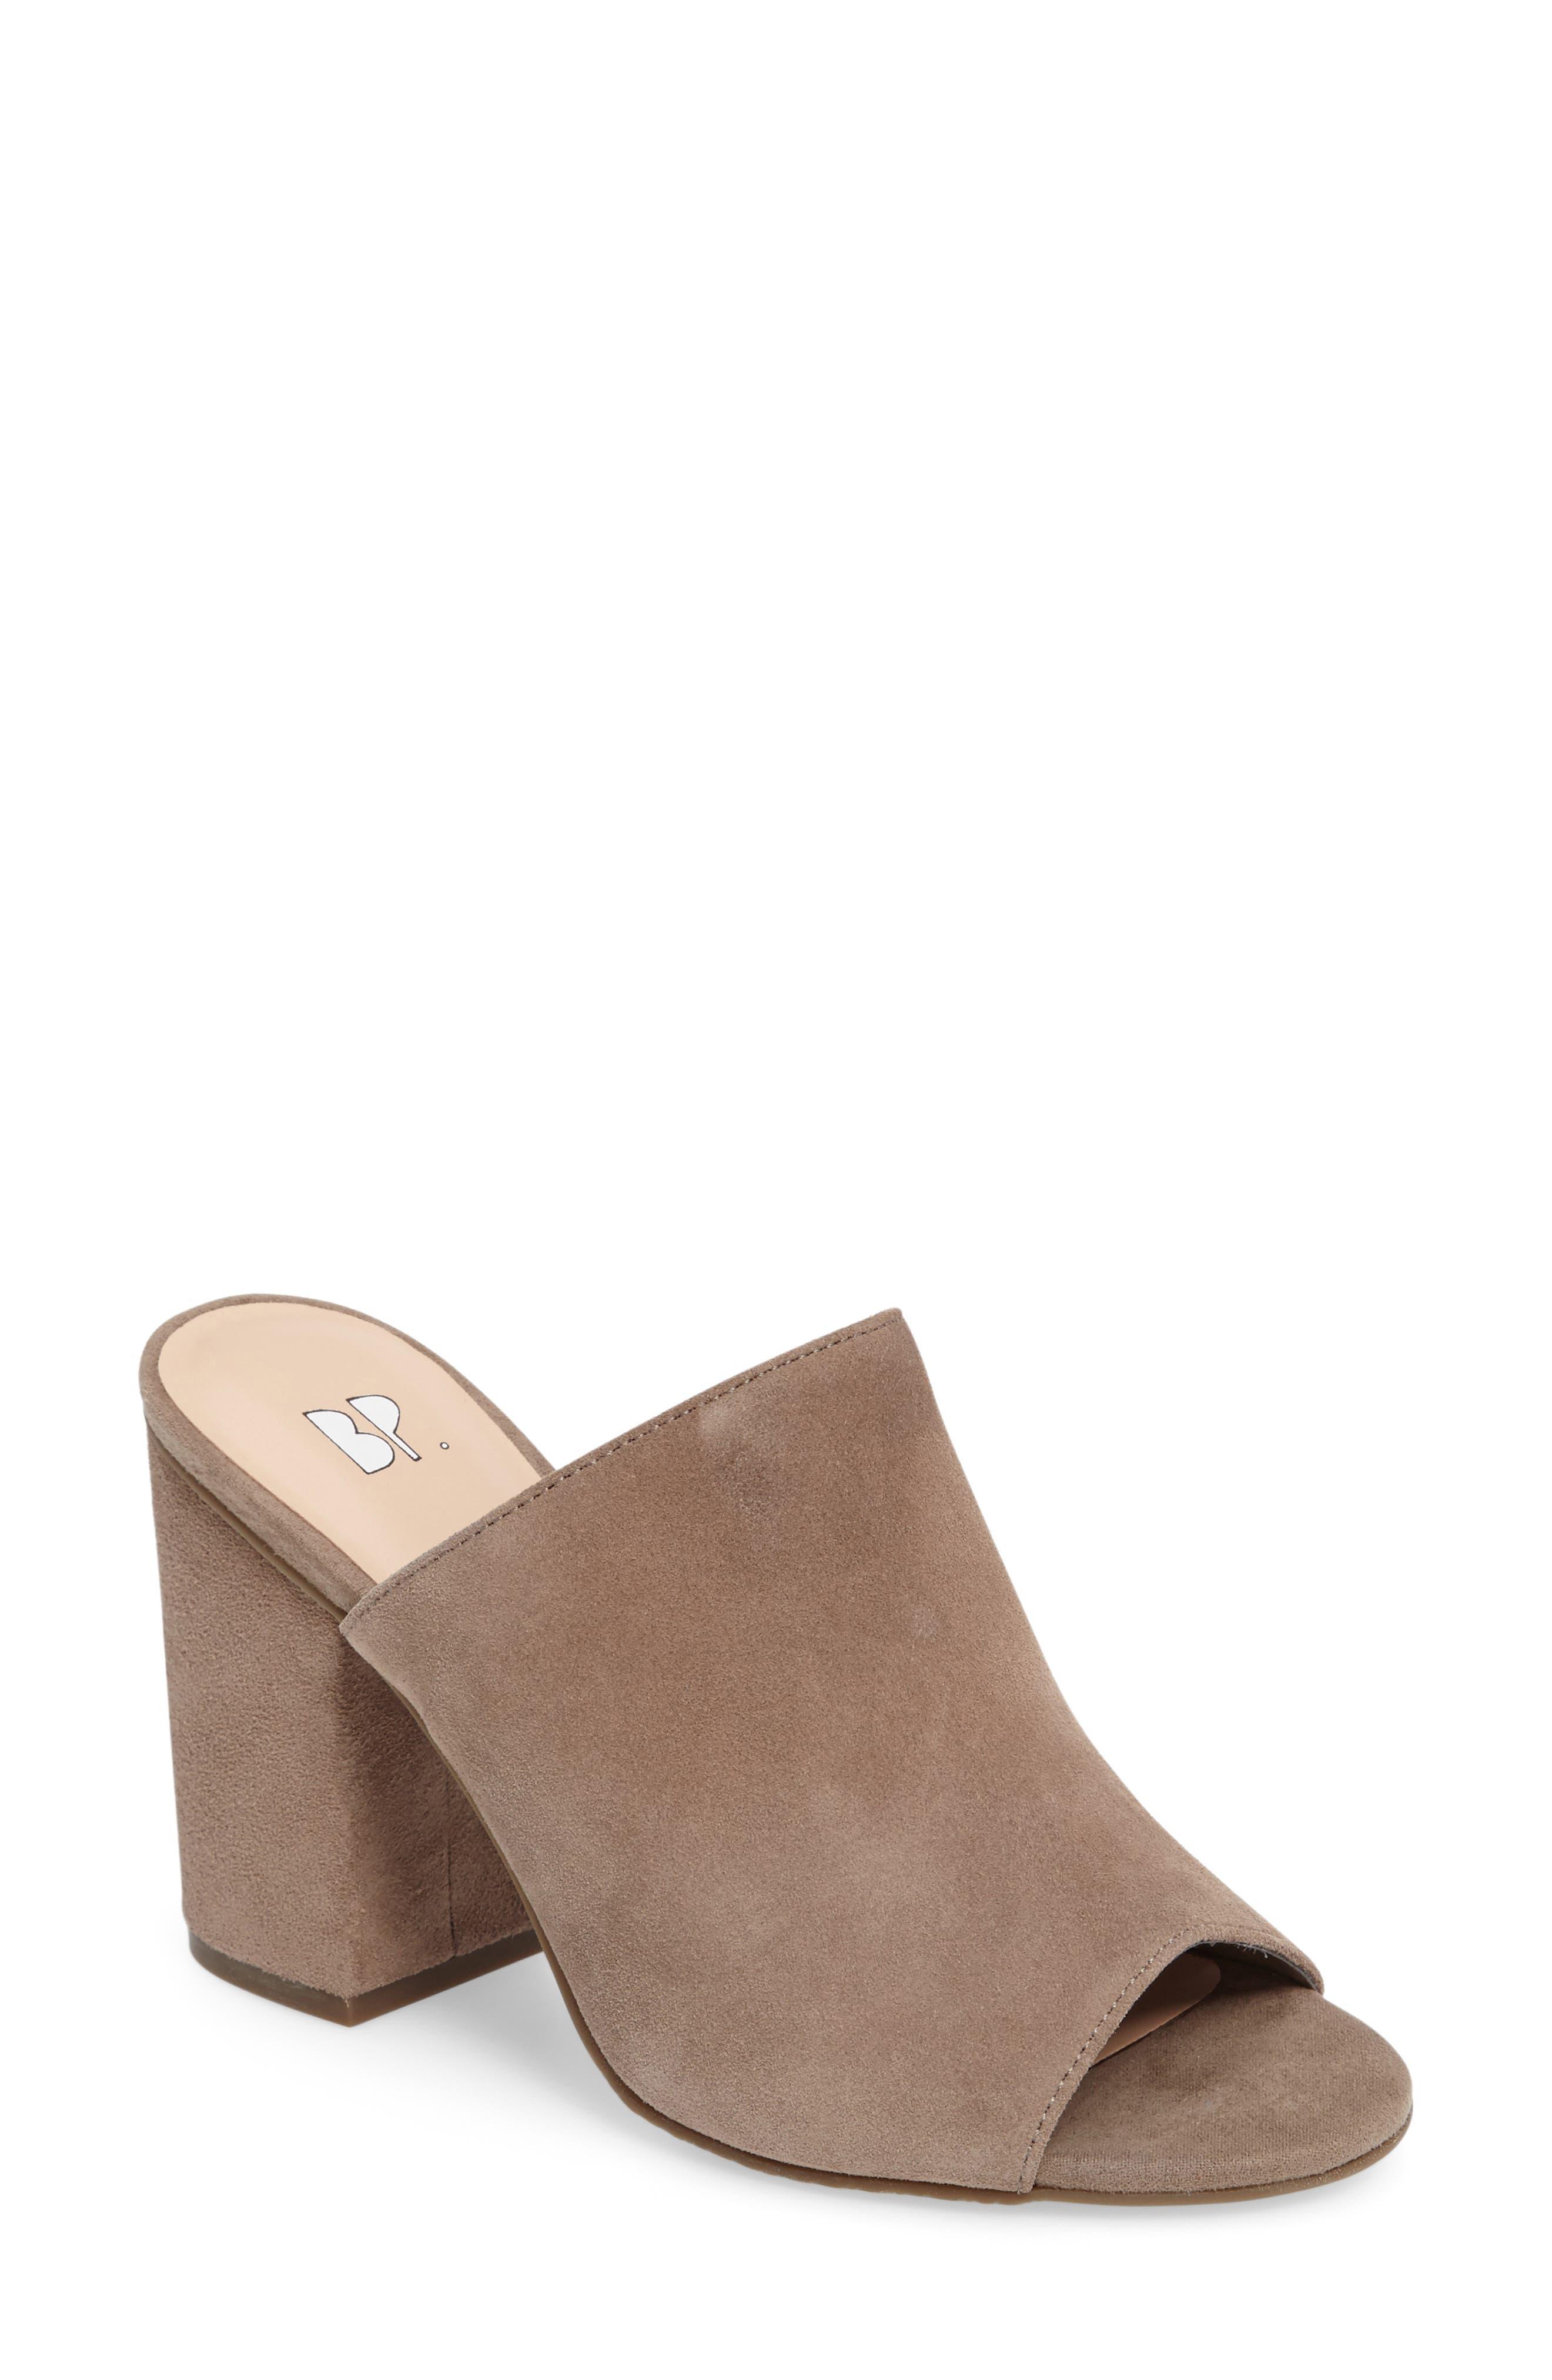 Tale Block Heel Sandal,                             Main thumbnail 2, color,